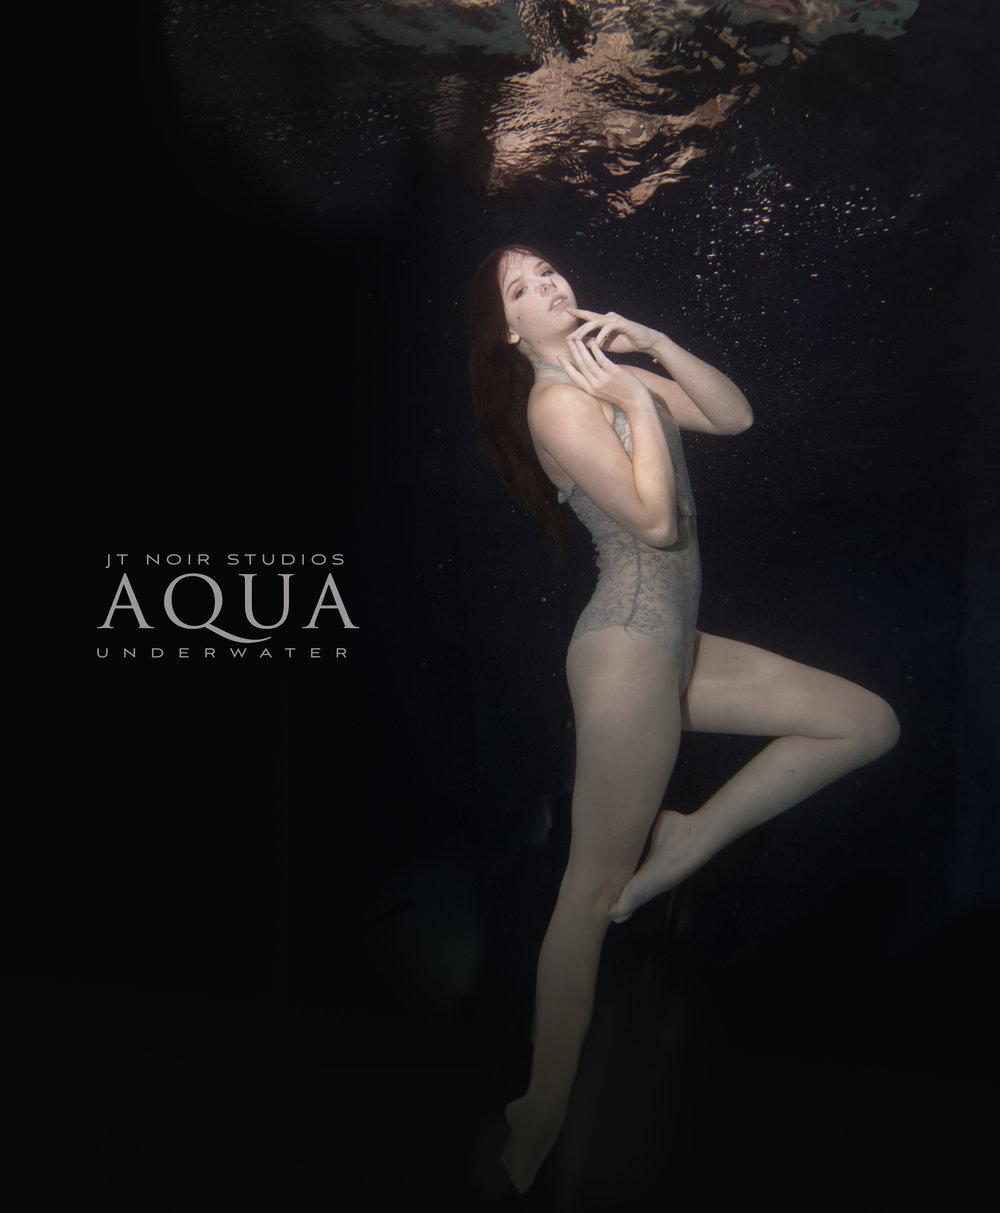 JTAqua_Underwater_Lingerie-2.jpg